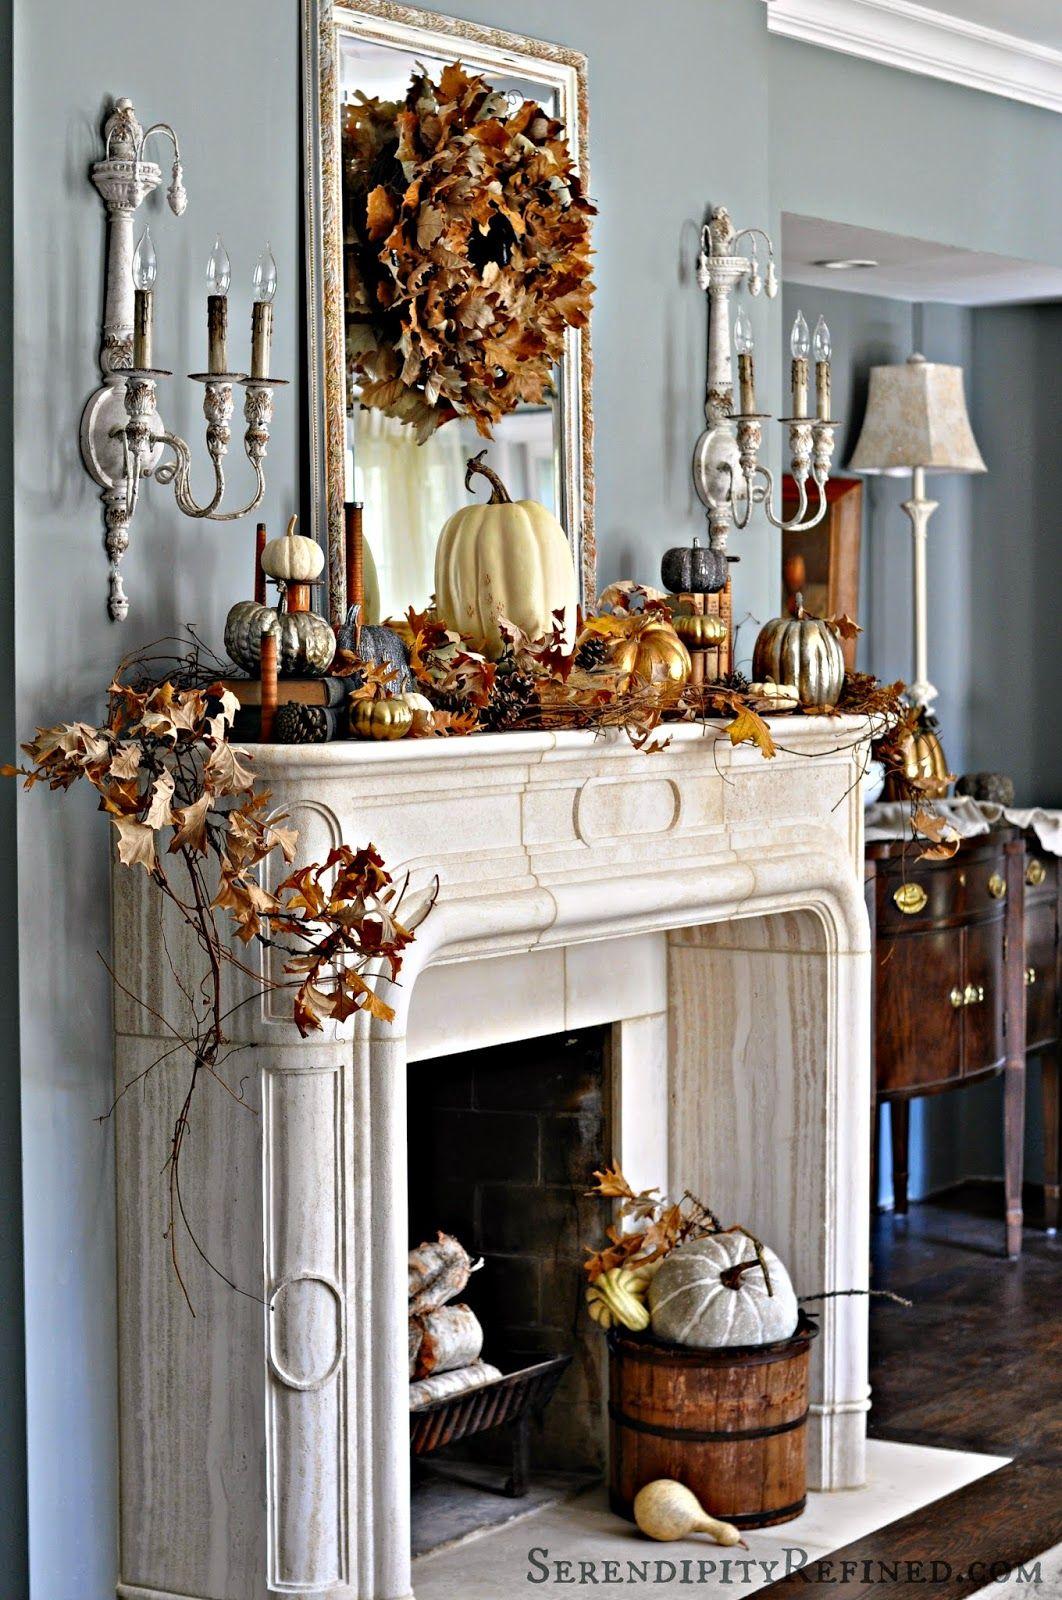 & 35 Fall Mantel Decorating Ideas - Halloween Mantel Decorations